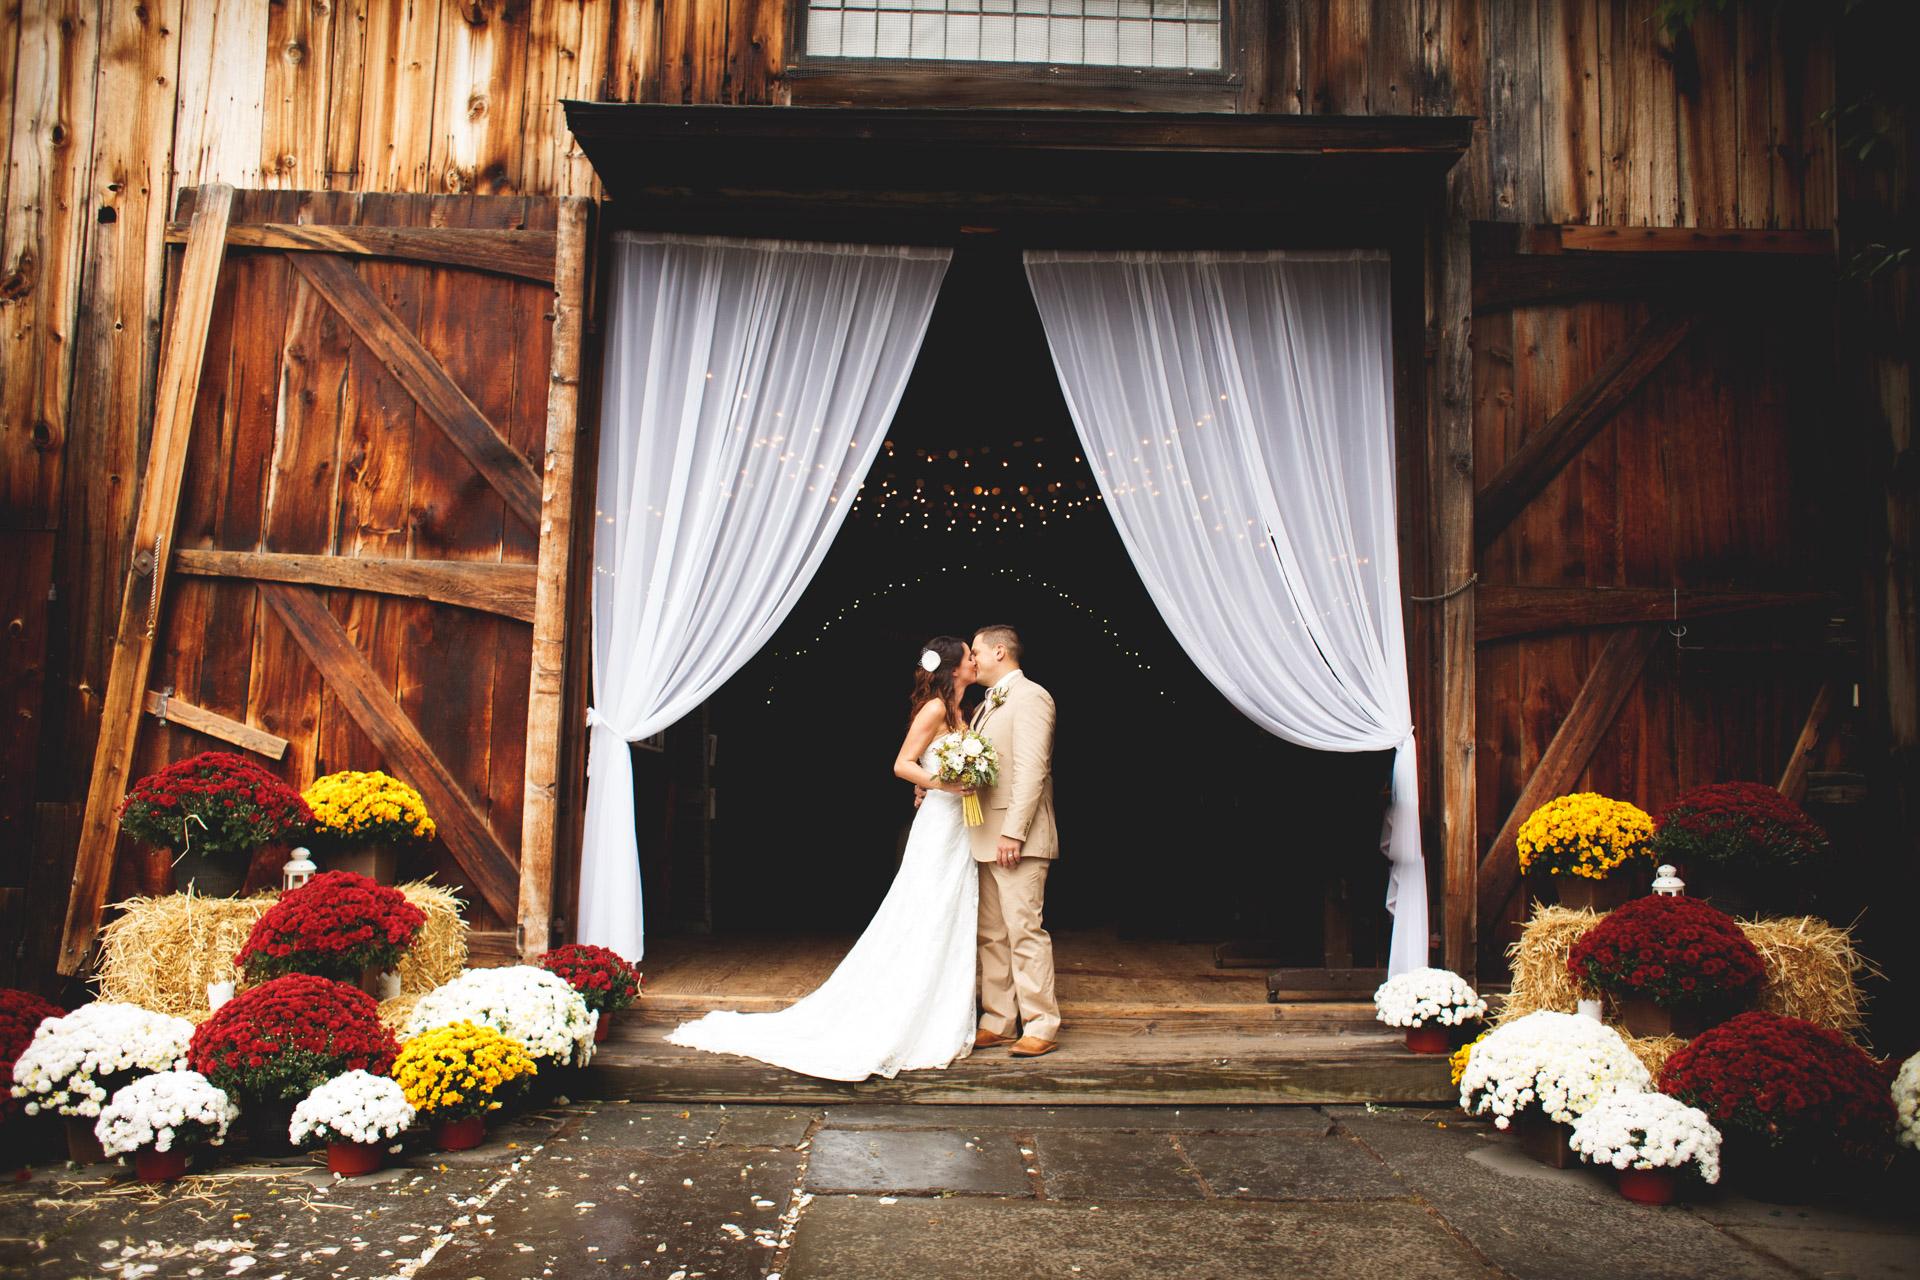 Wedding Photos at Webb Barn Wethersfield -22.jpg